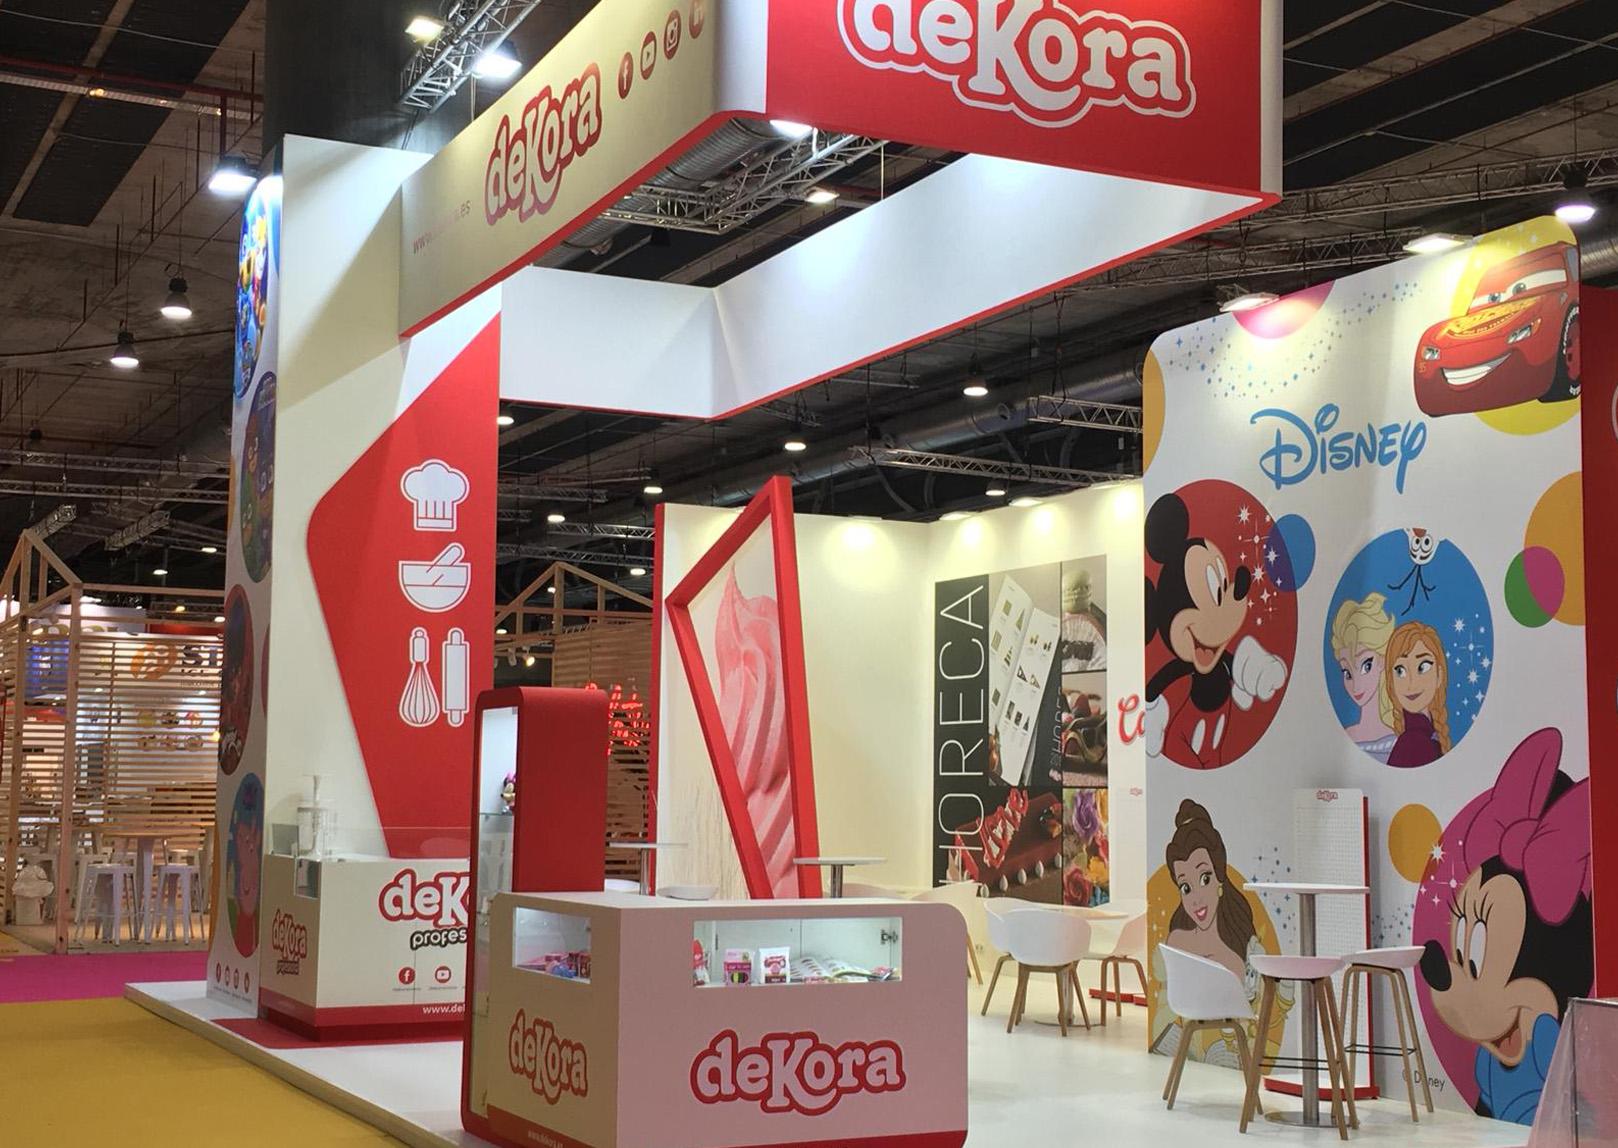 stand-dekora-feria-intersicop-madrid-2019-03